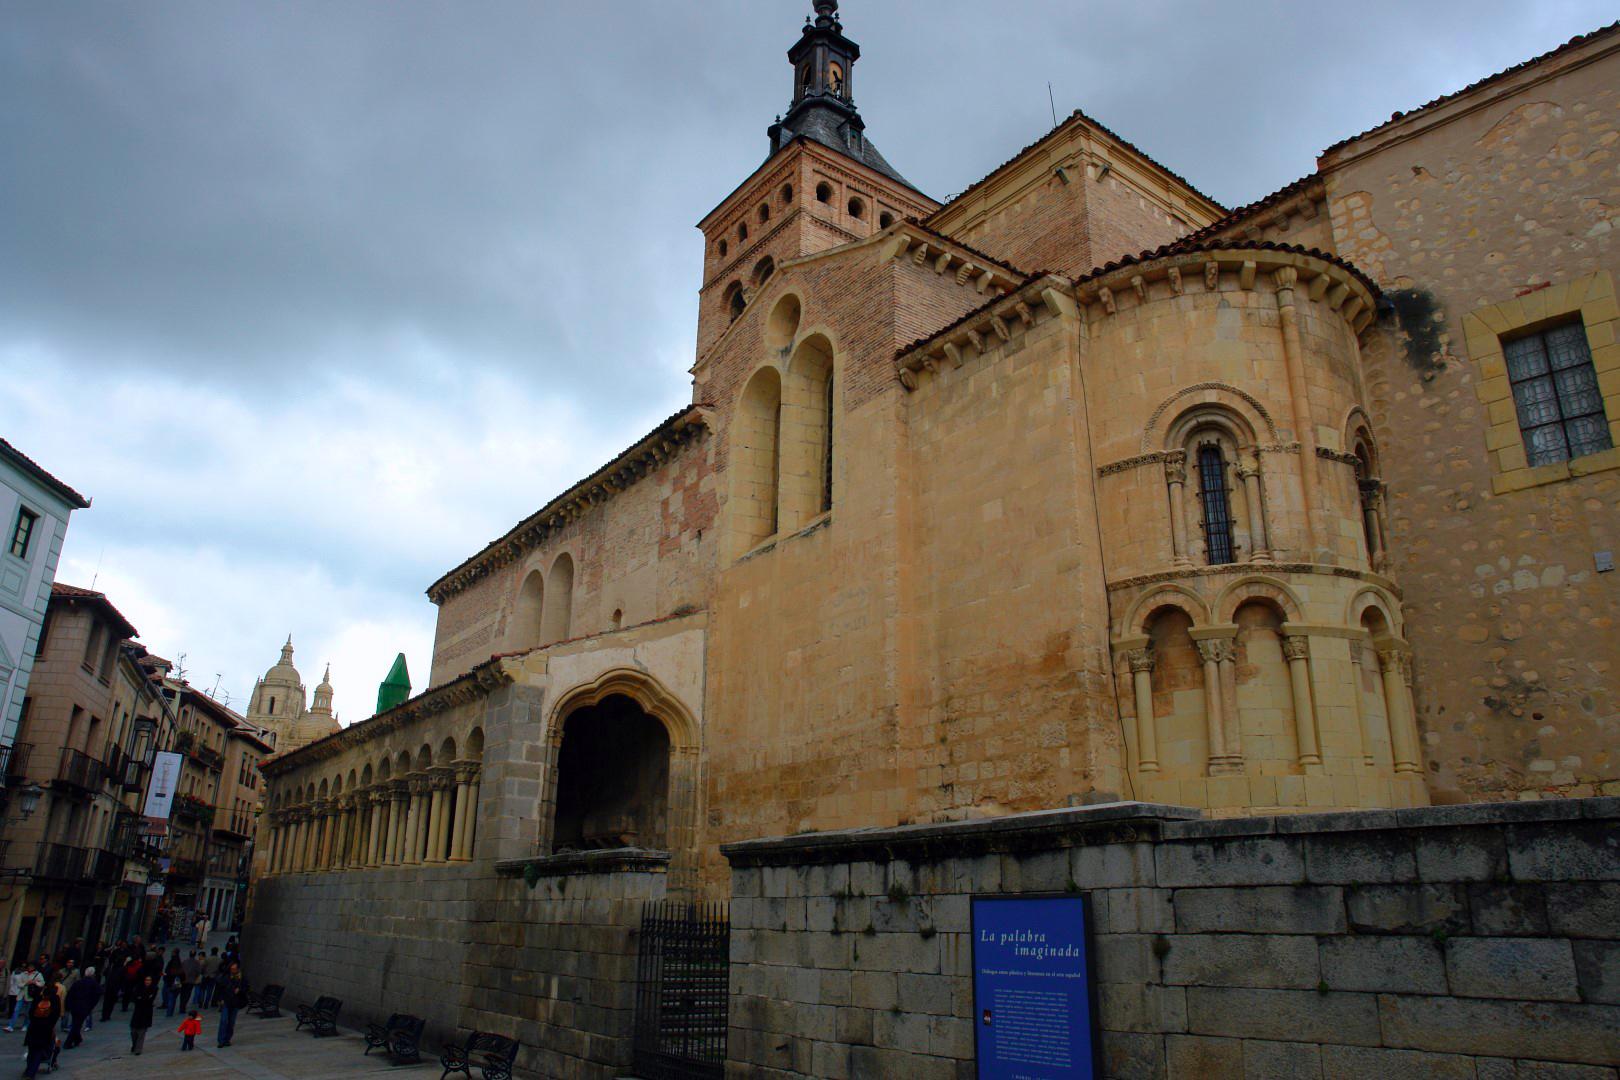 Qué ver Segovia, España qué ver en segovia - 30289238434 4e44be4d2c o - Qué ver en Segovia, España